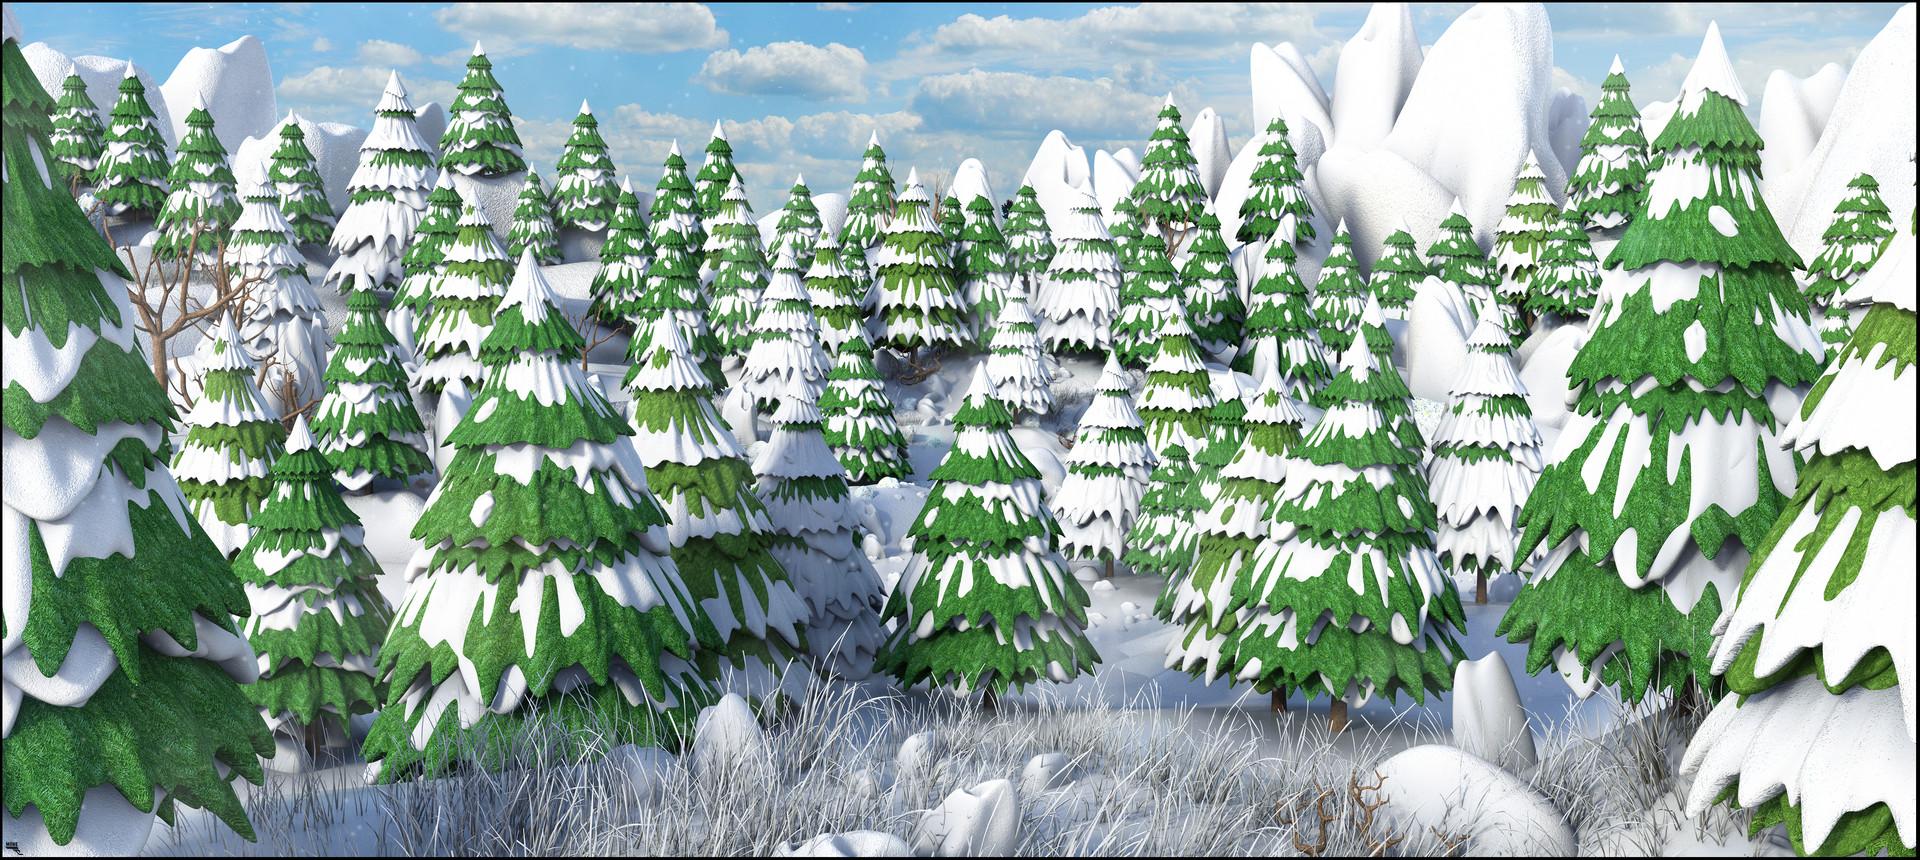 Marc mons snow1